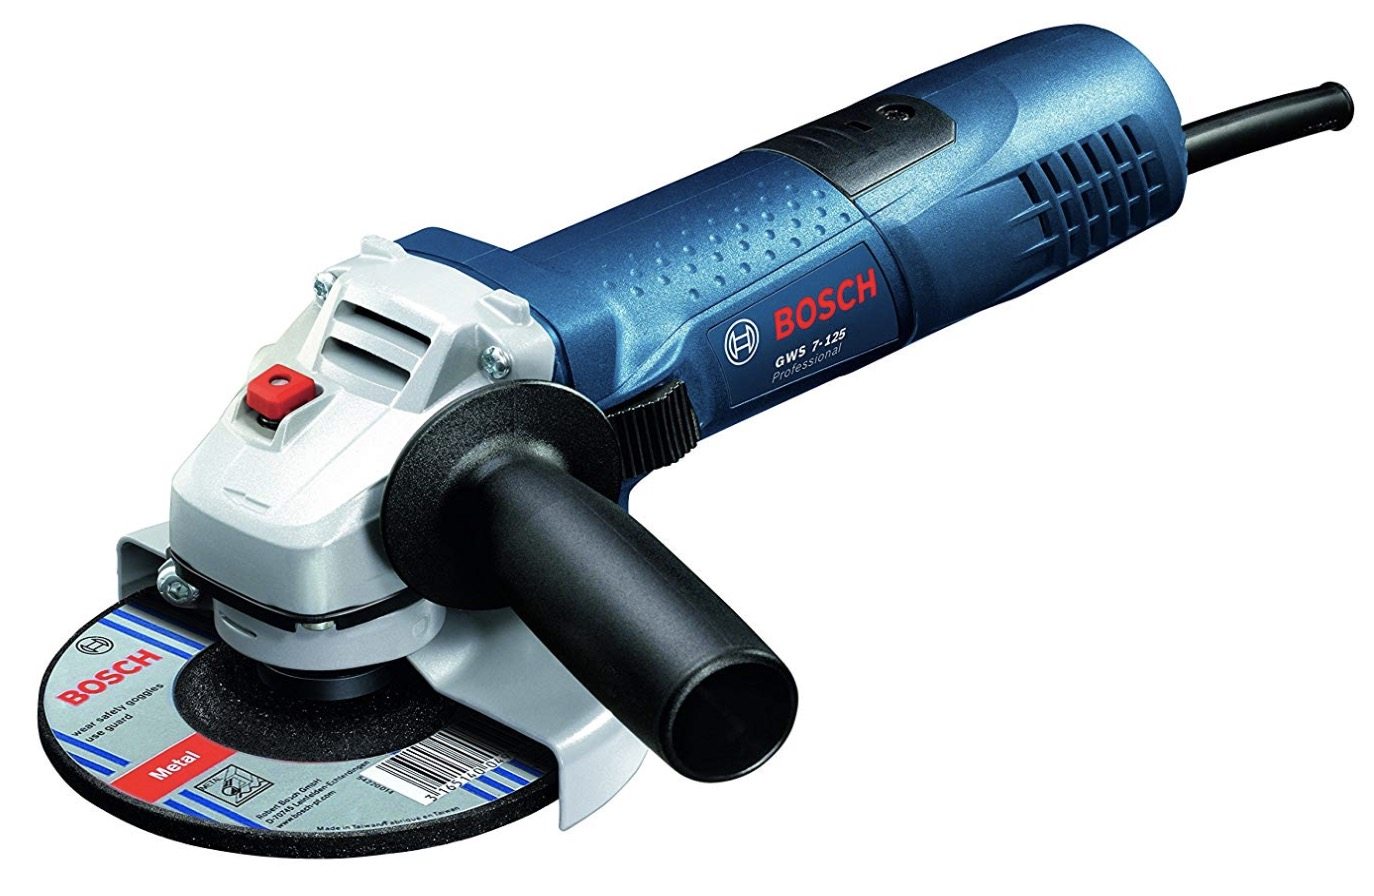 Code promo Amazon : Meuleuse Angulaire Bosch Professional GWS 7-125 à 66,90€